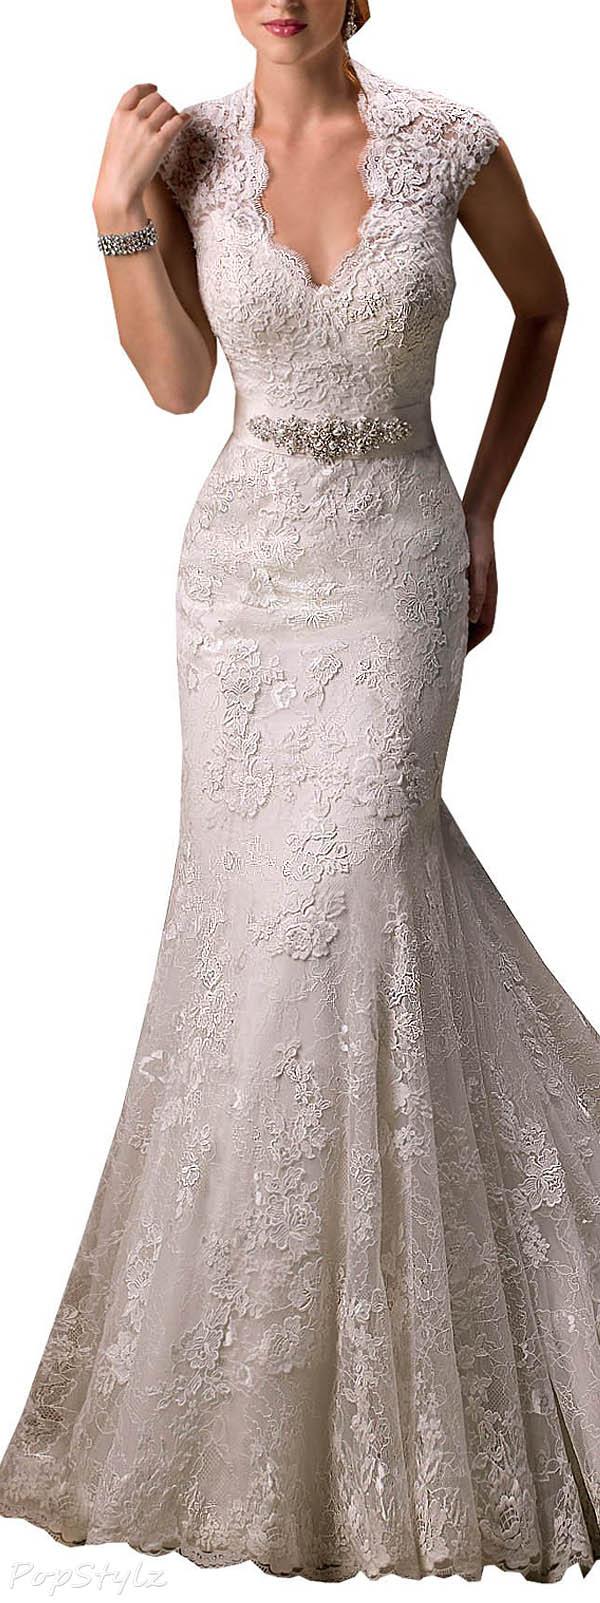 Harshori V-Neckline Cap-Sleeve Lace & Tulle Satin Wedding Gown